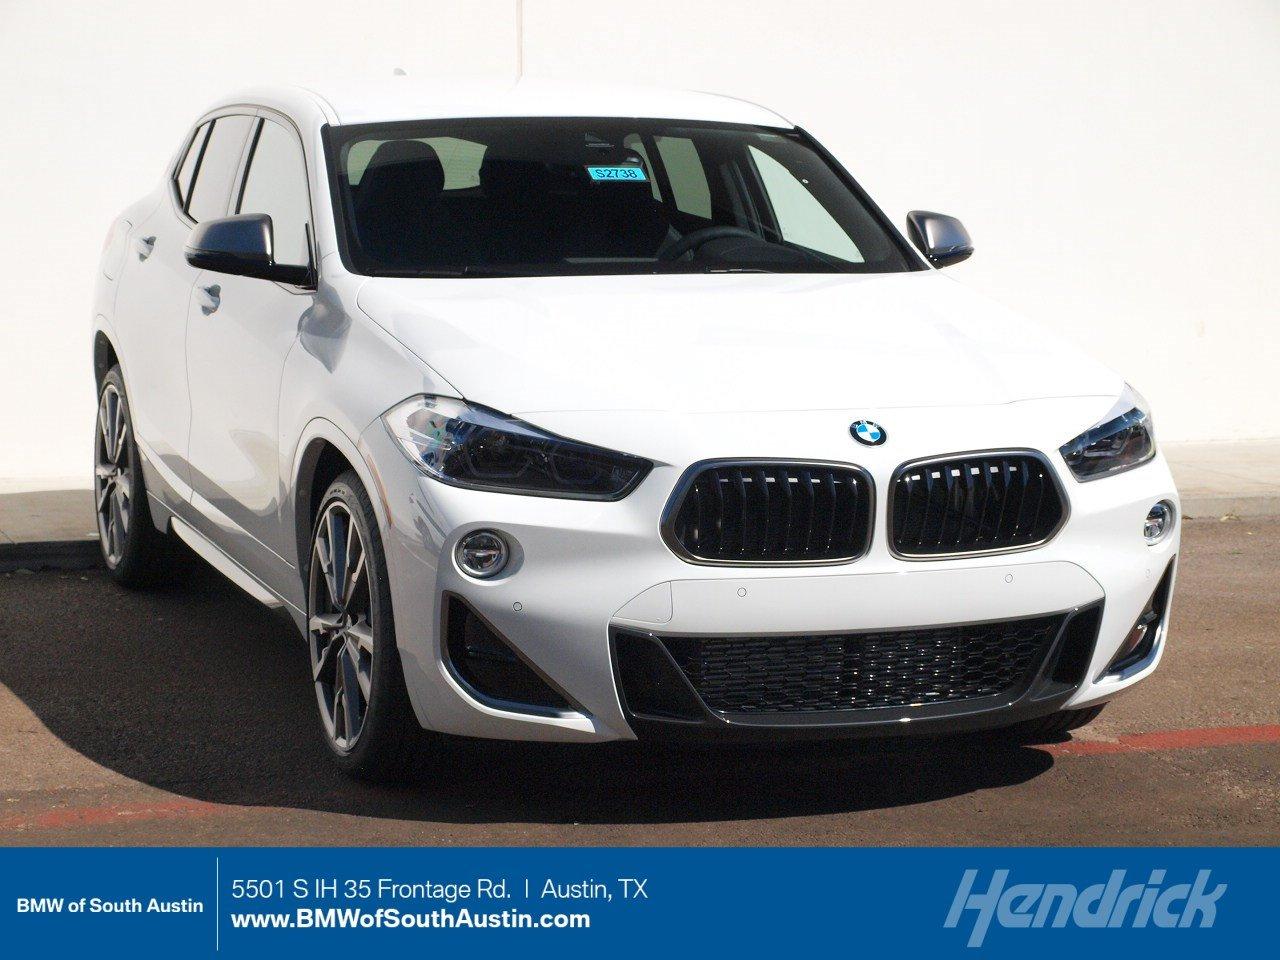 2020 BMW X2 M35i SUV